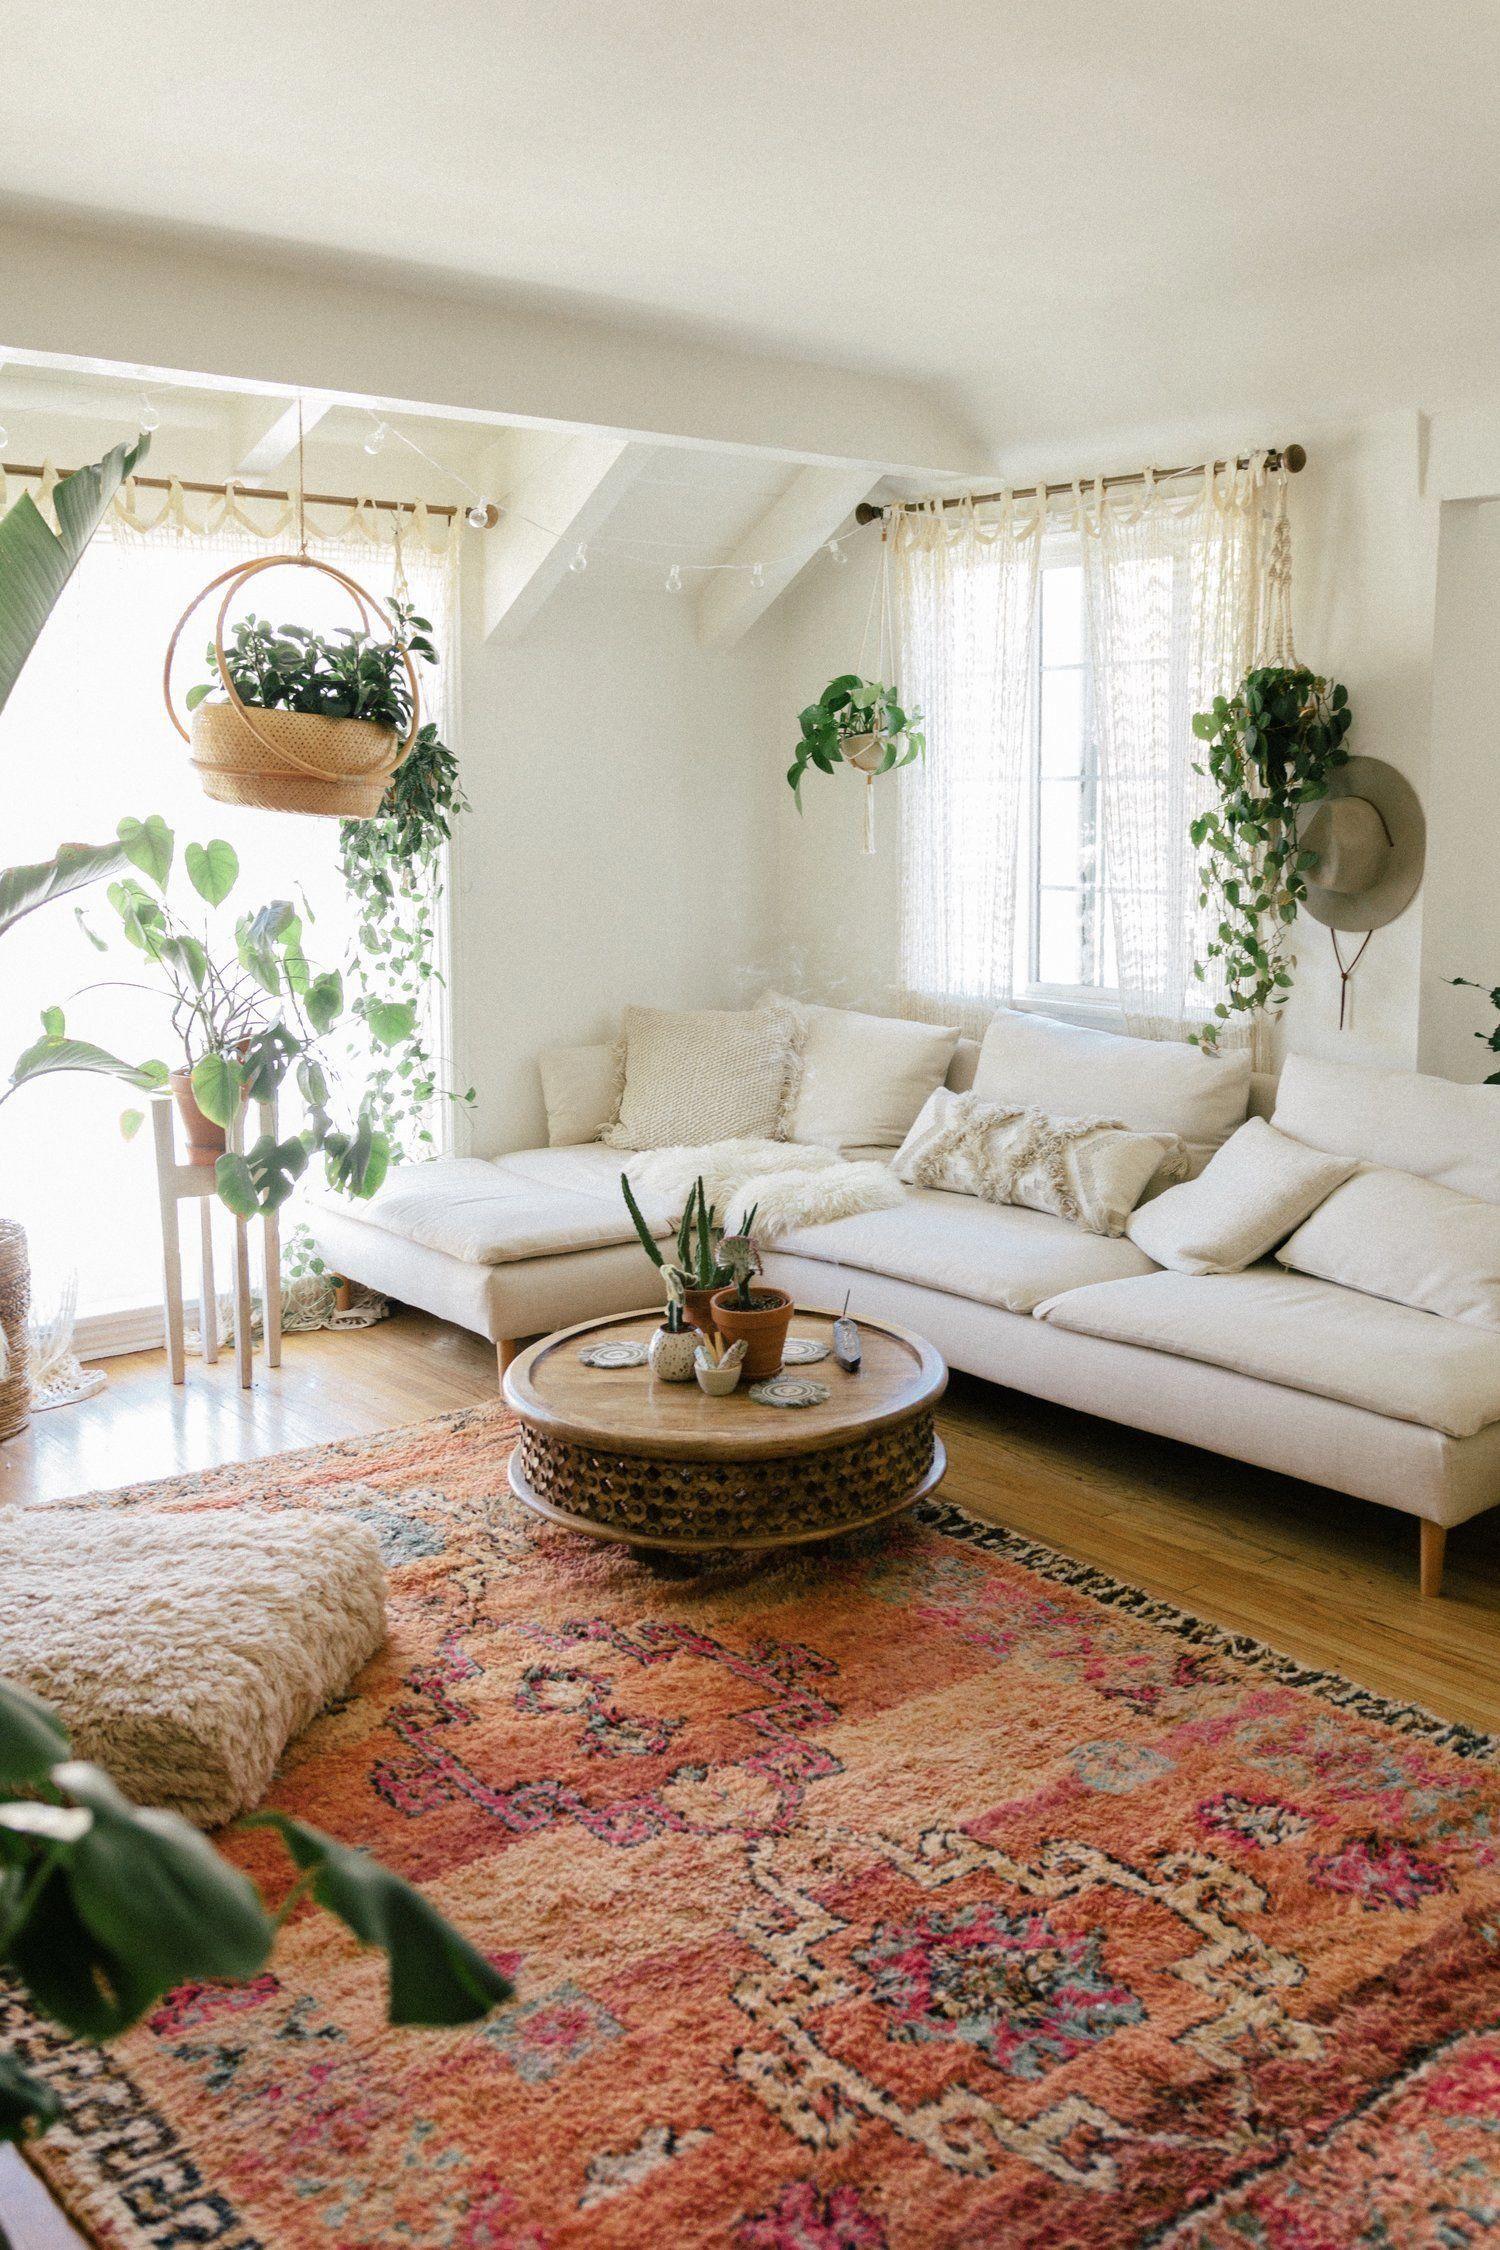 Spring Refresh At Home | blackandblooms.com | @saratoufali #livingroomideas